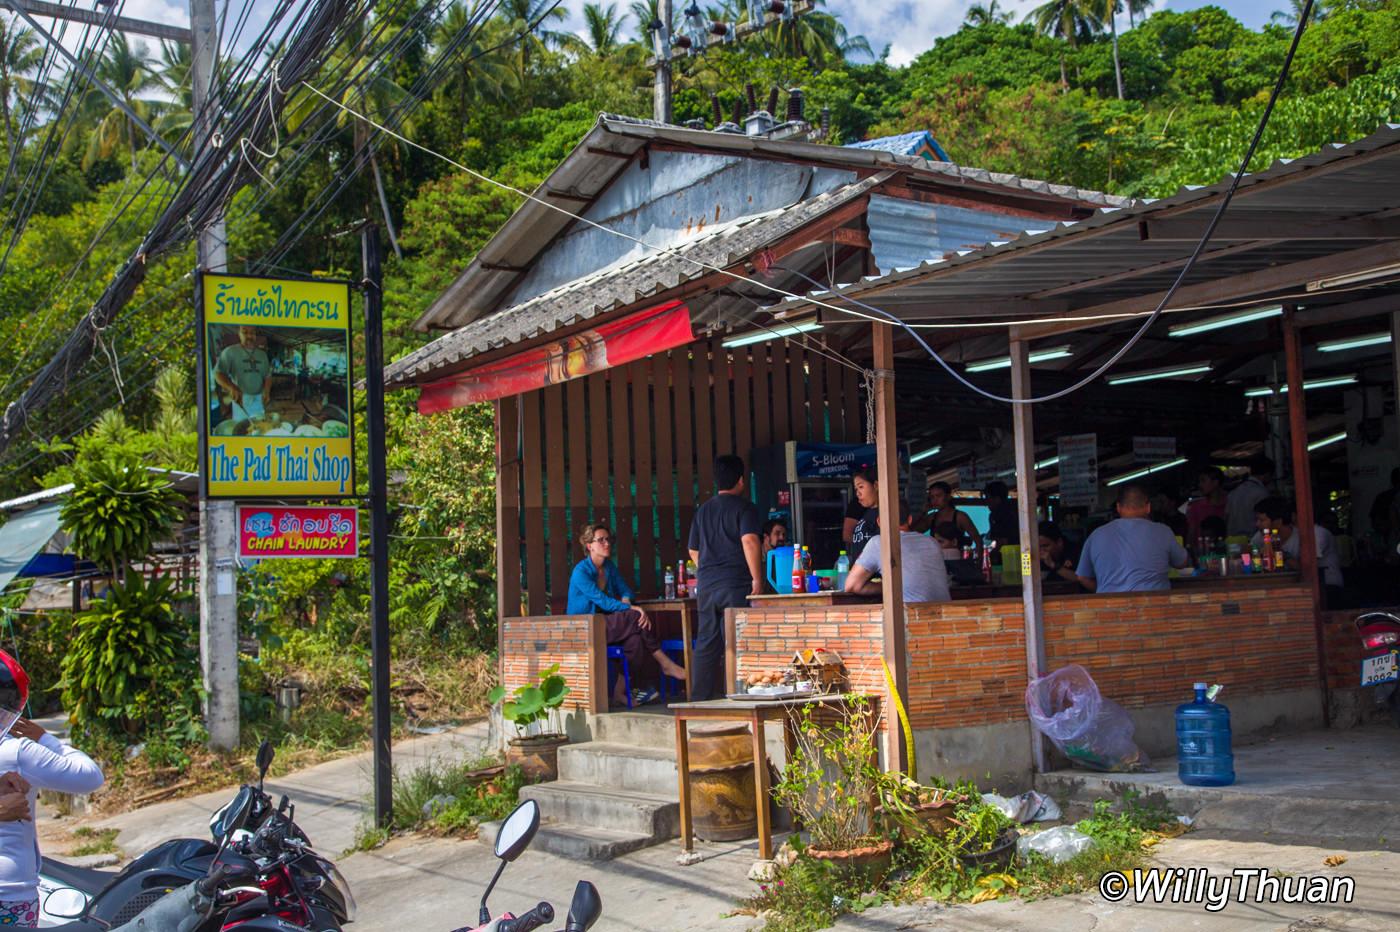 Amazing Restaurant in Phuket-Pad Thai Shop